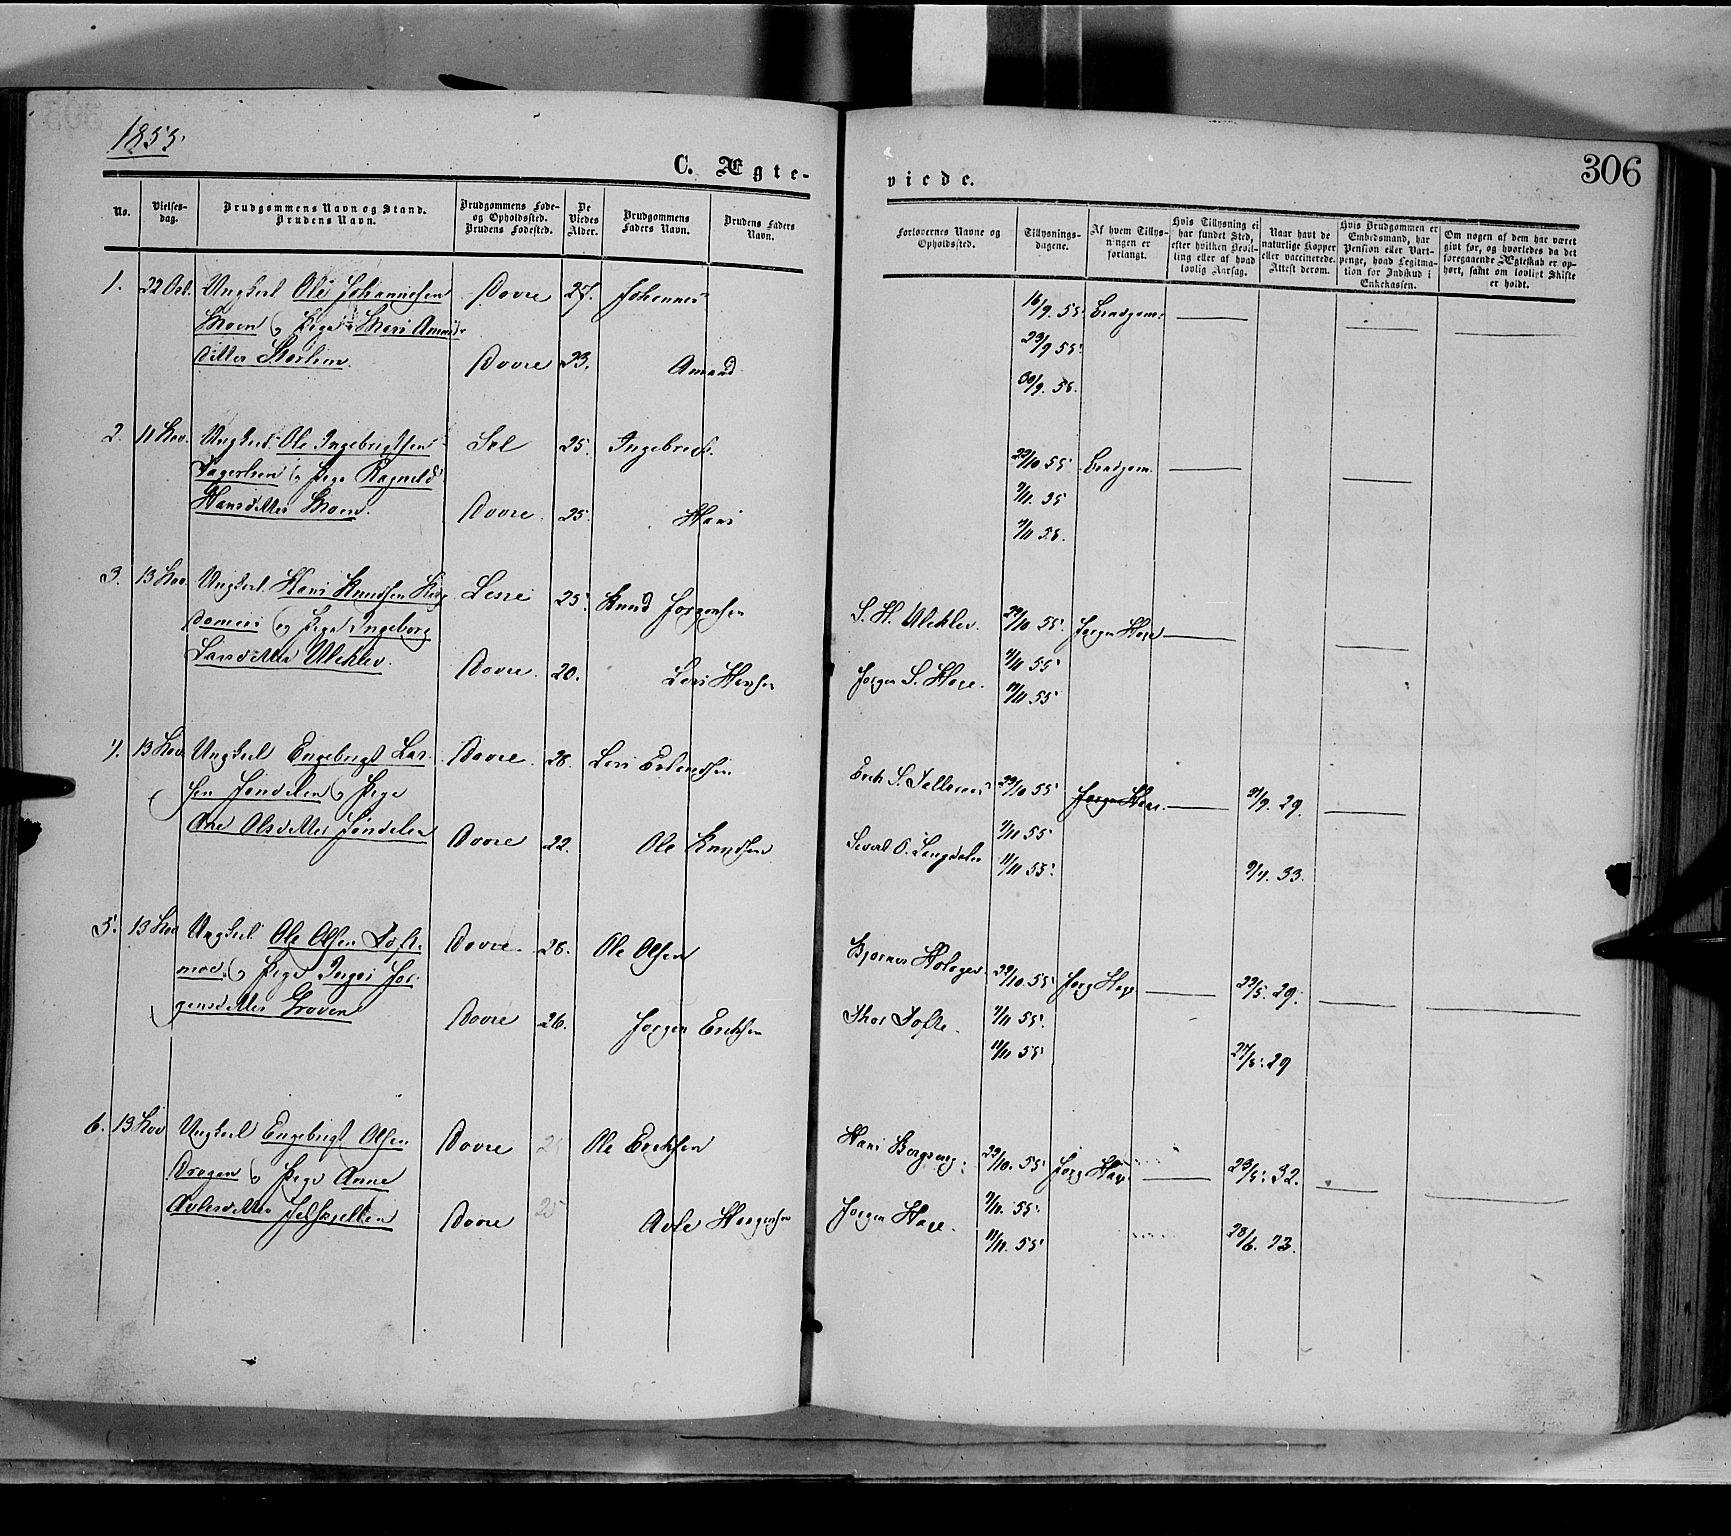 SAH, Dovre prestekontor, Ministerialbok nr. 1, 1854-1878, s. 306